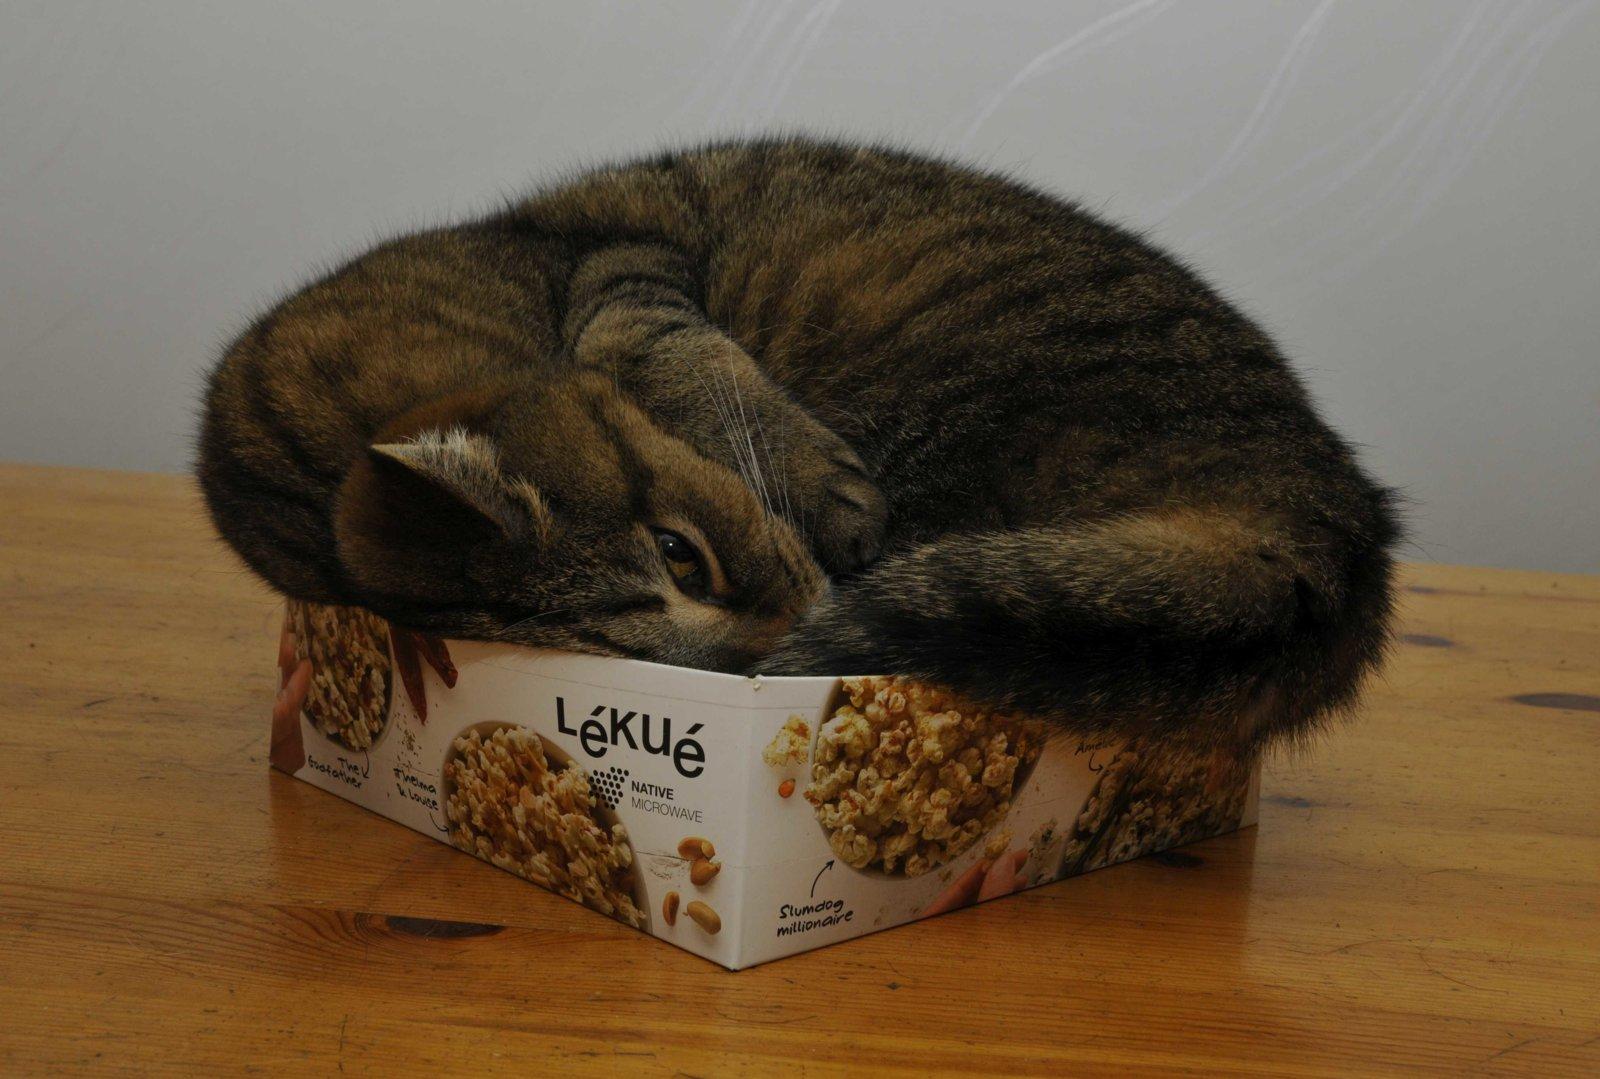 Ebbe på låda.